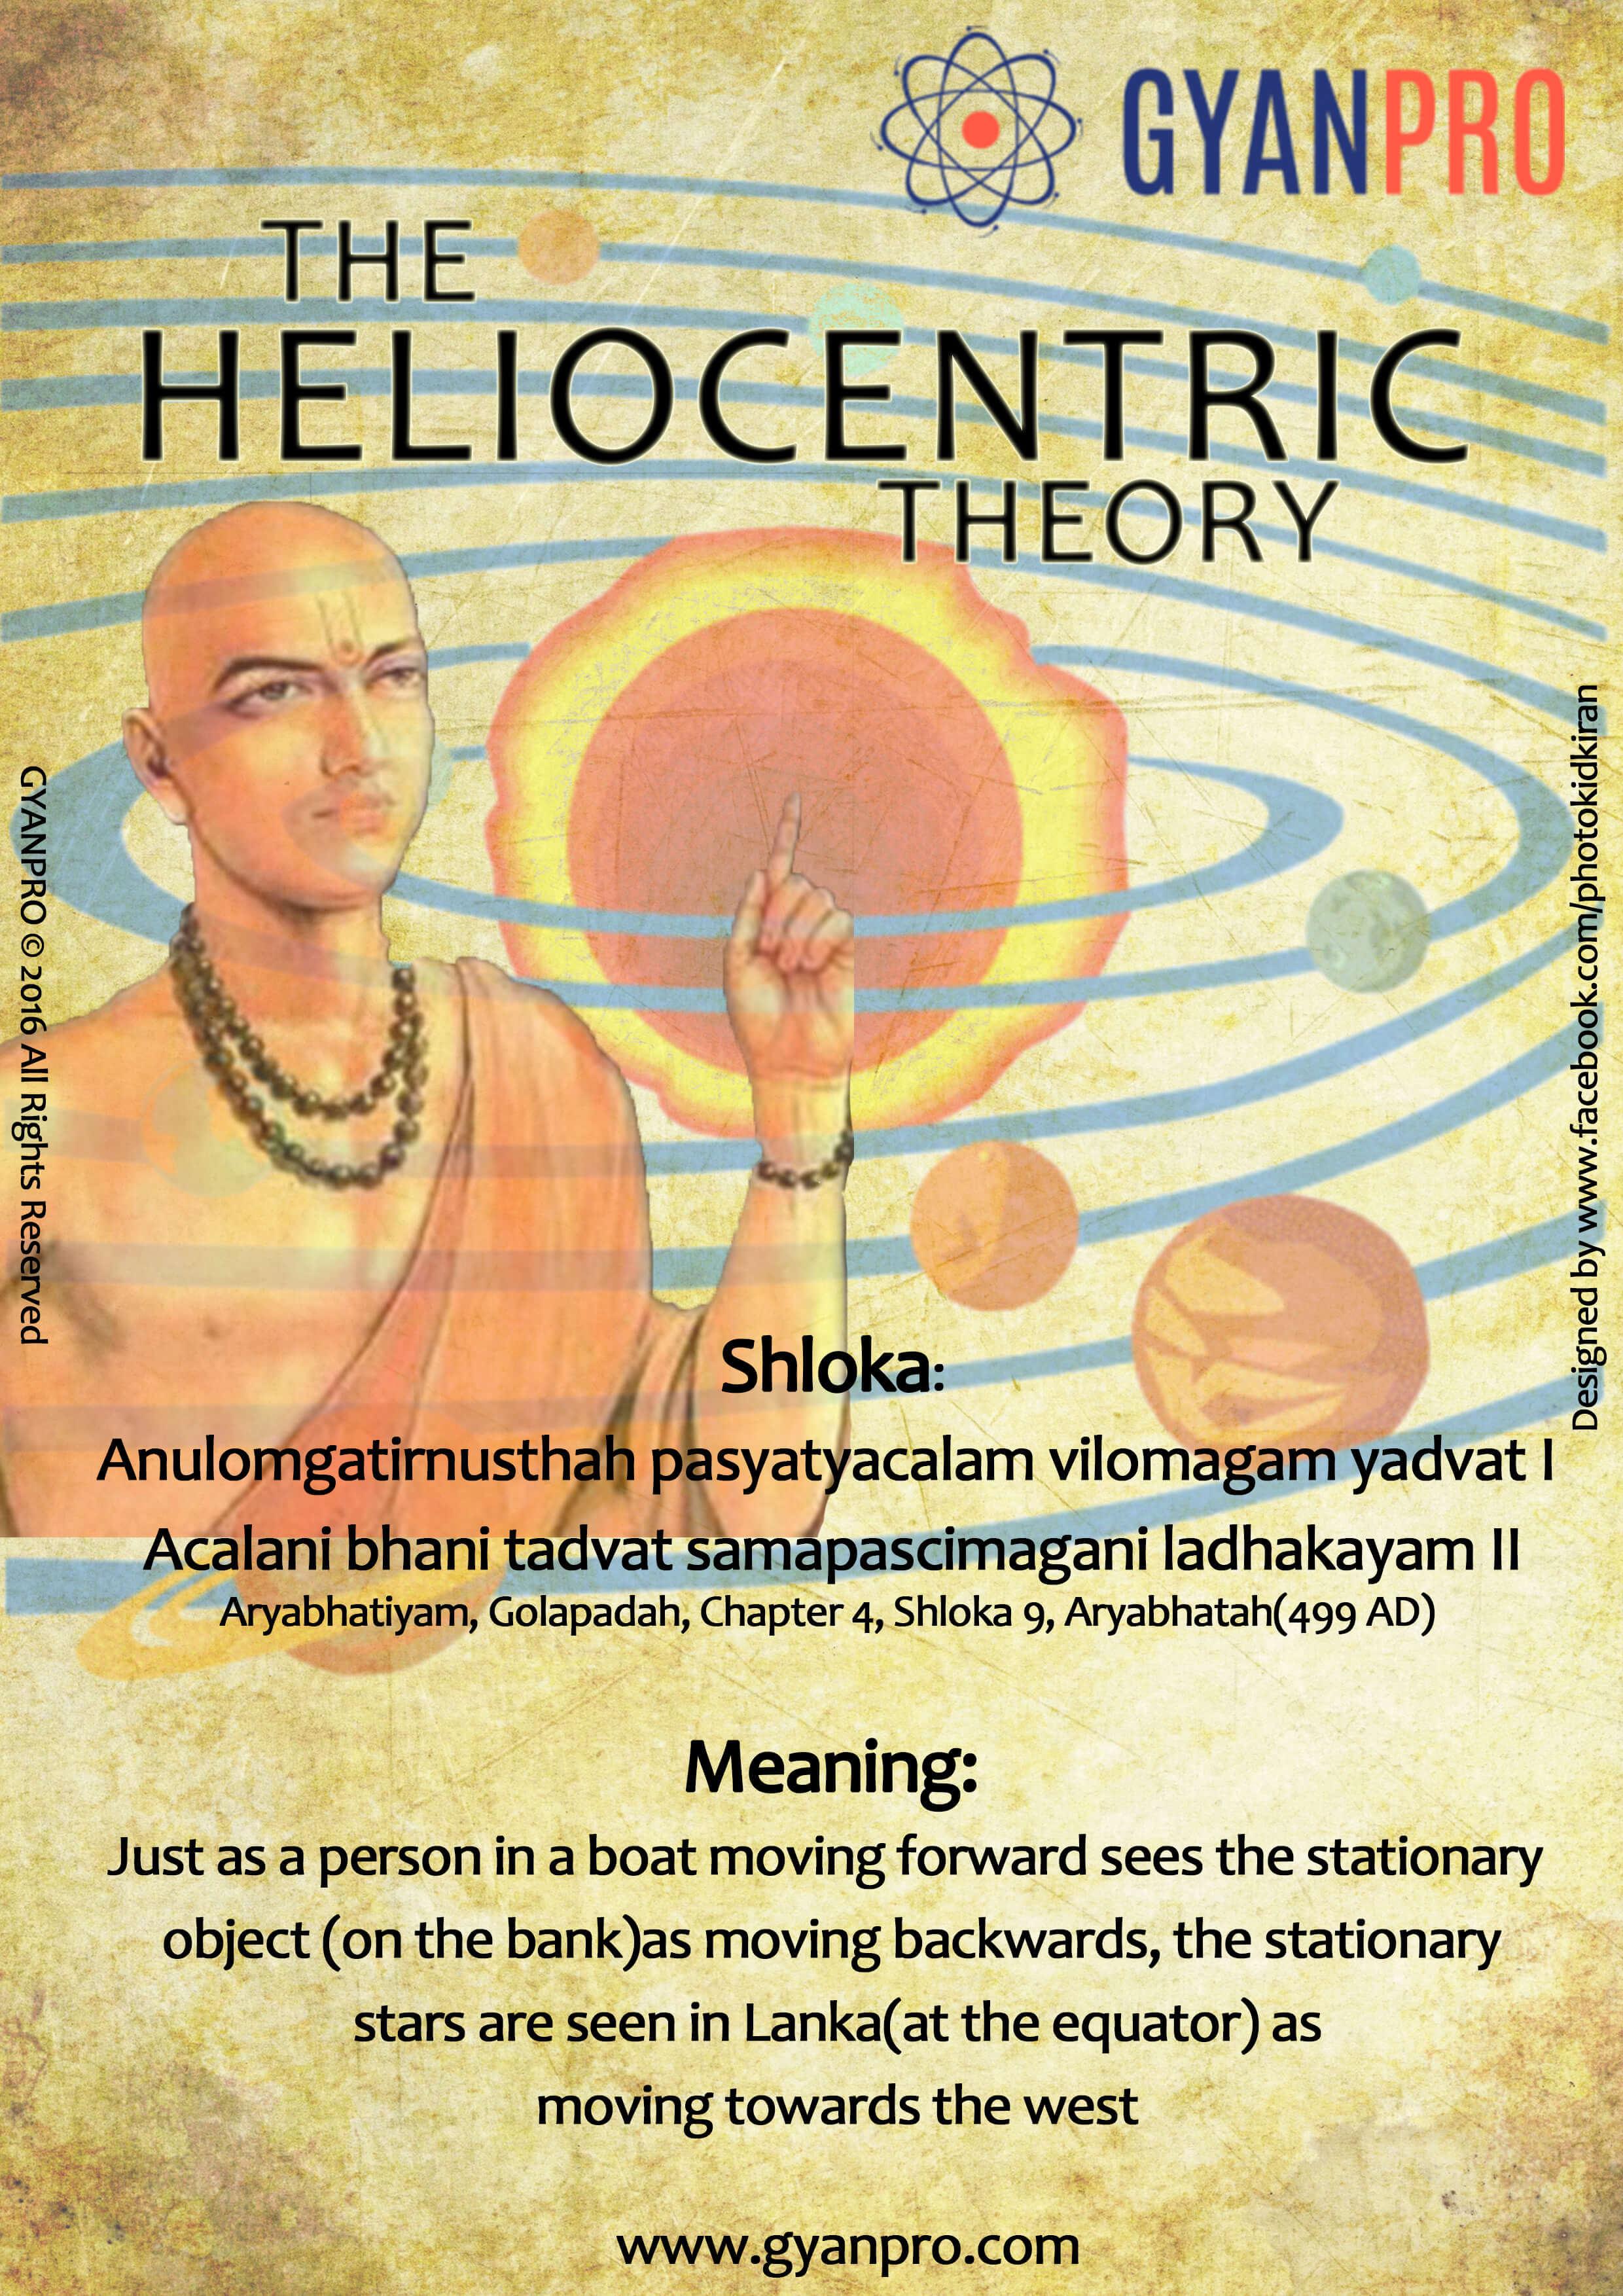 GYANPRO_heliocentrictheory